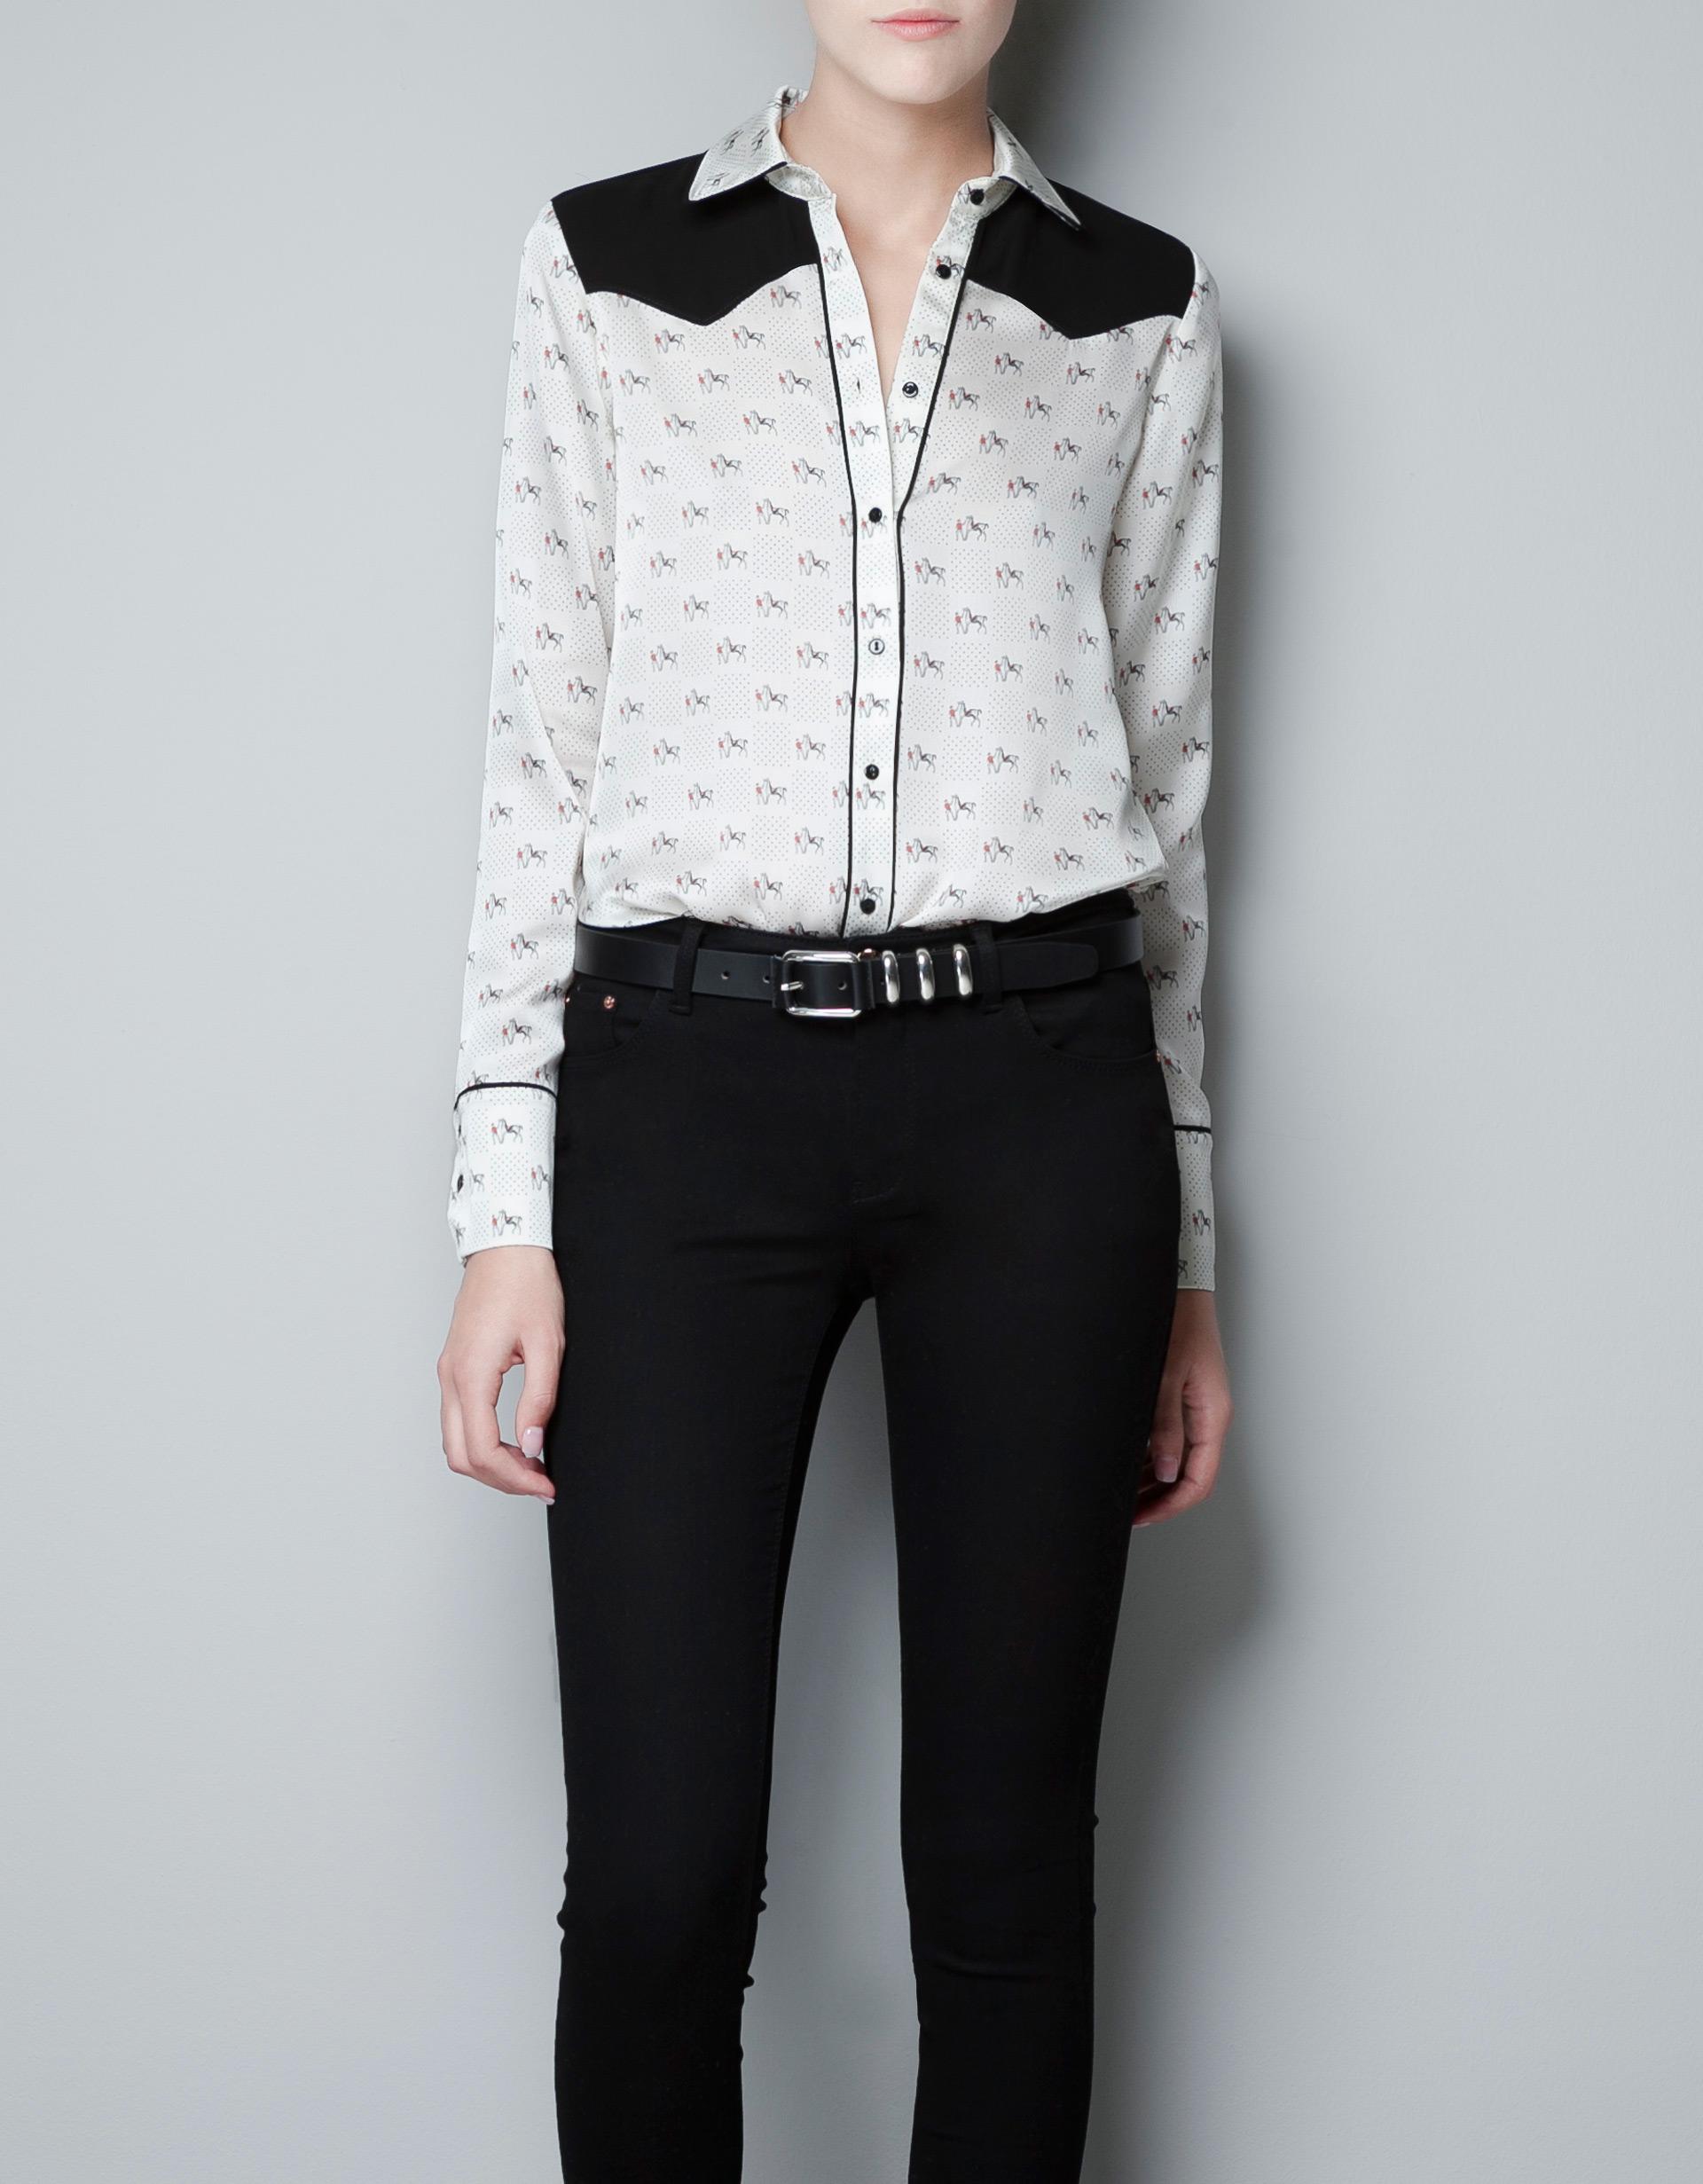 Horse Print Blouse Zara 34